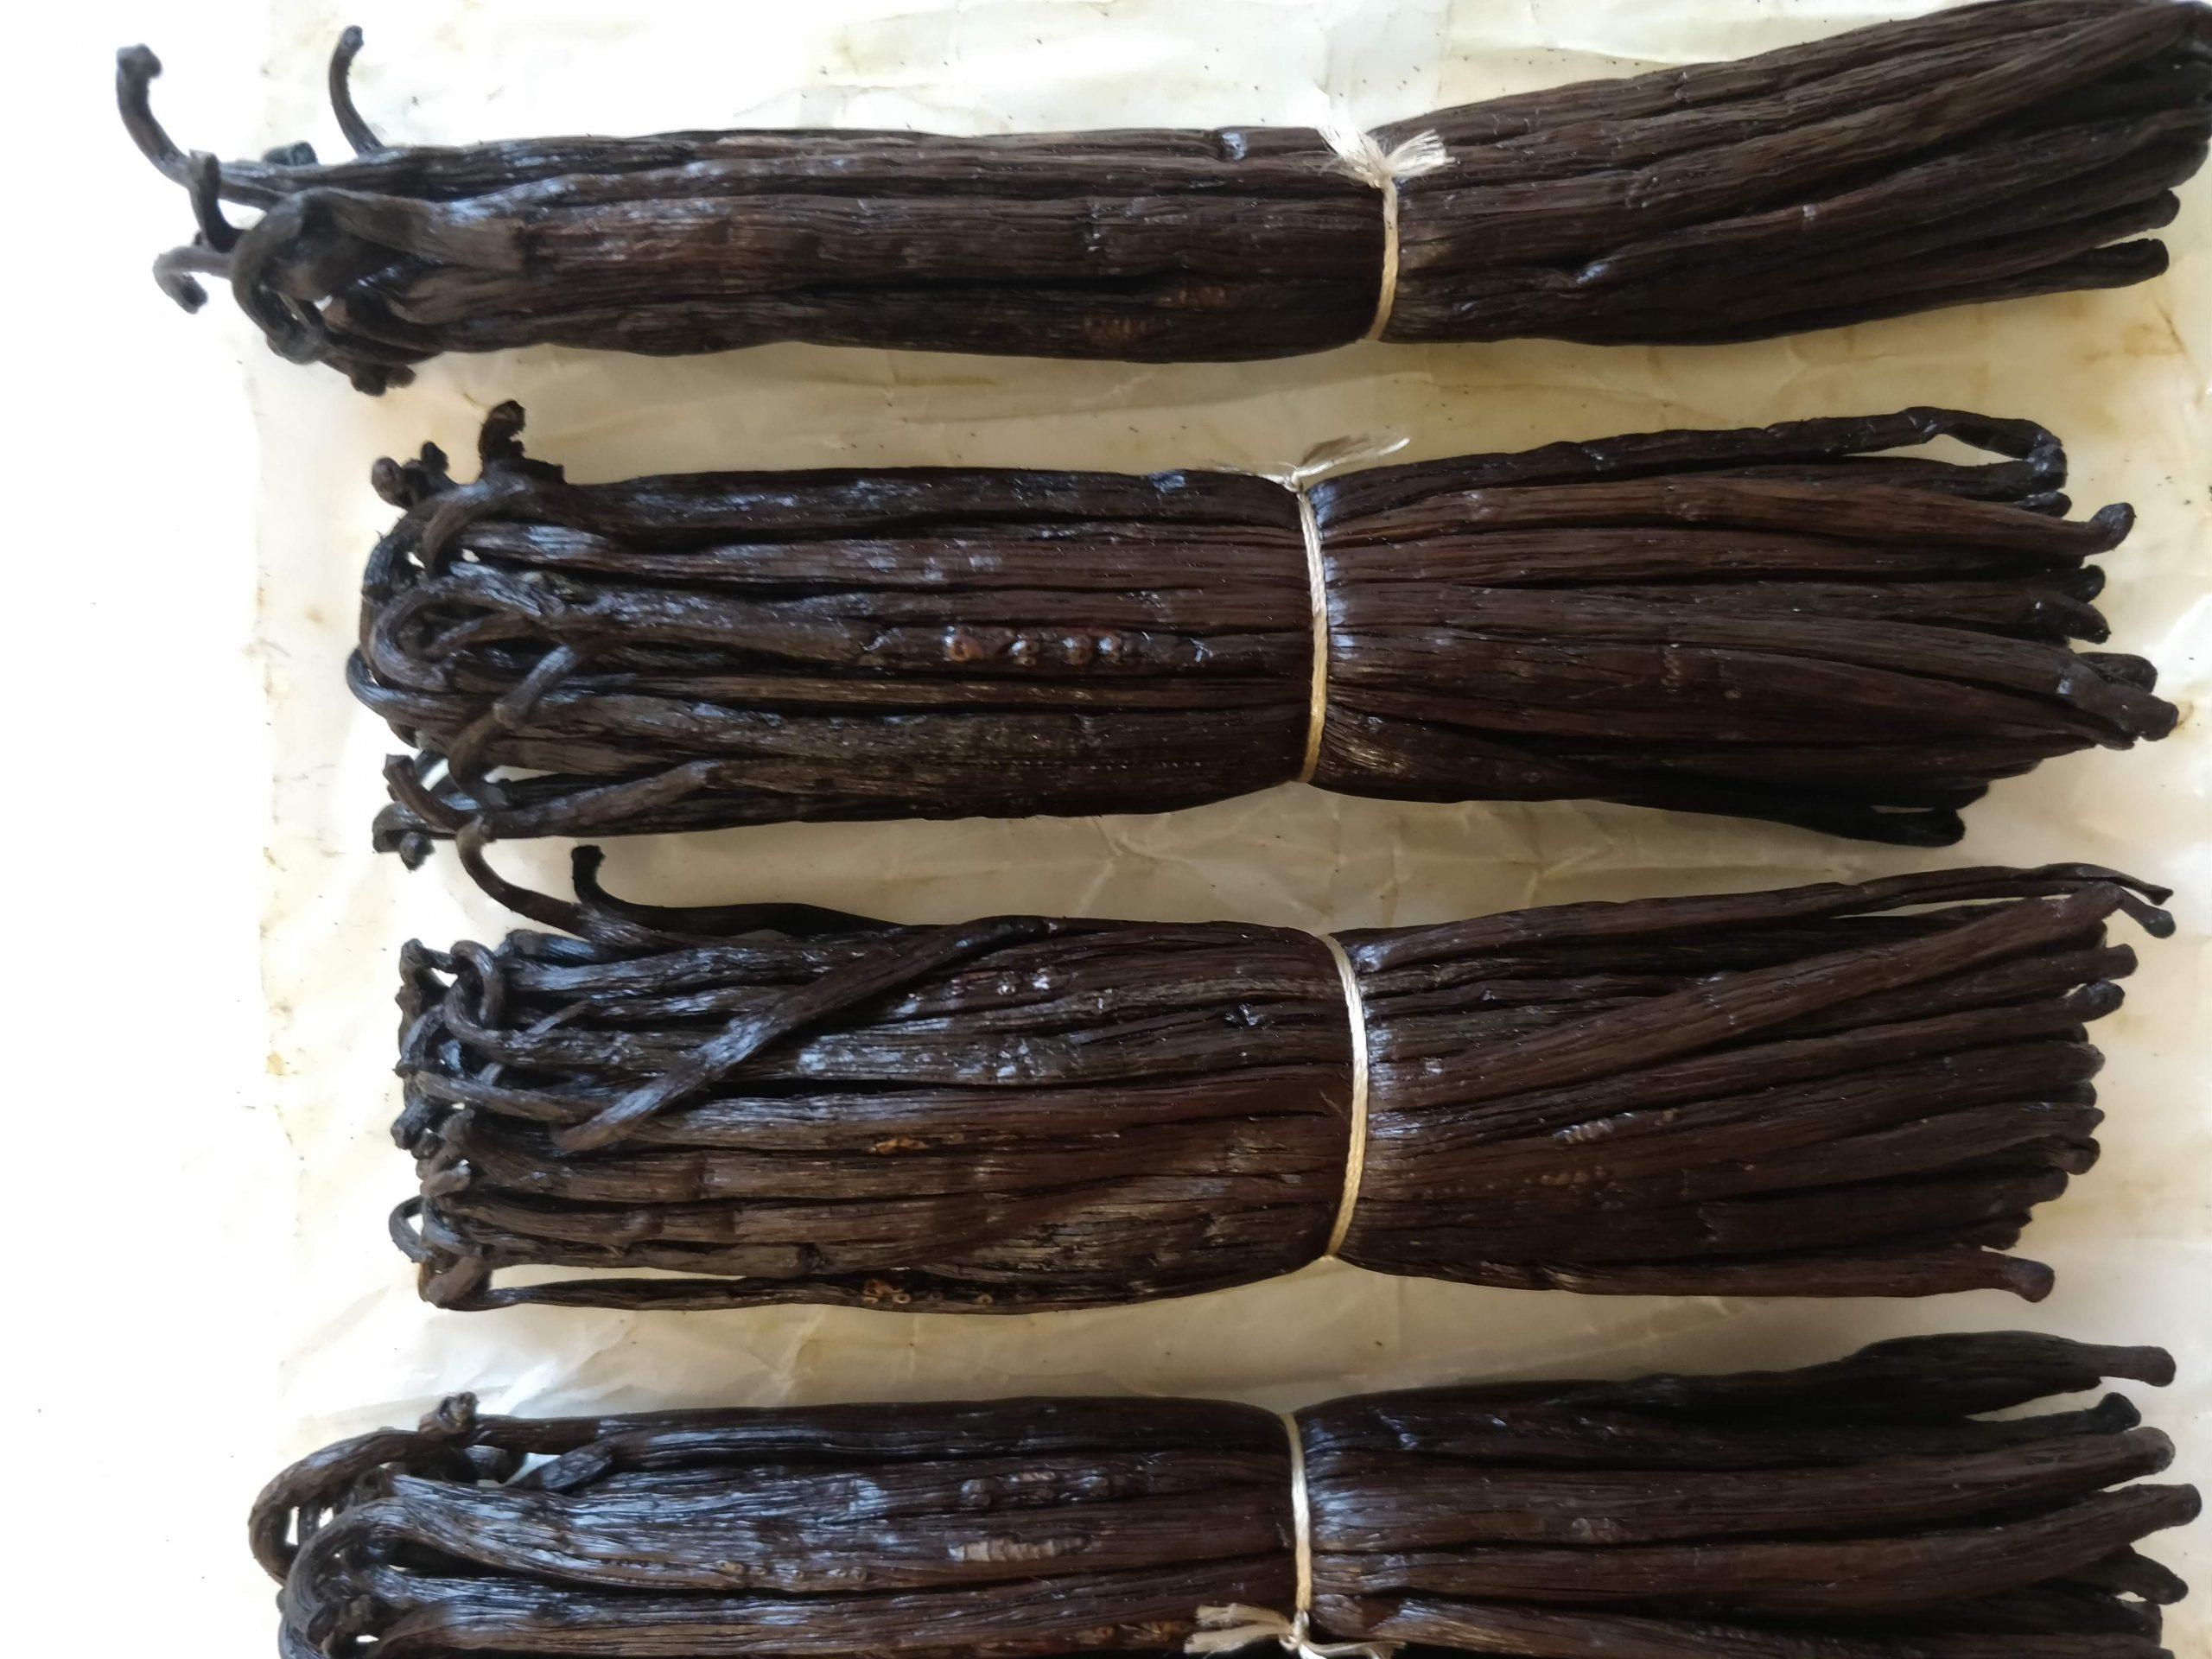 Knitspice-Grade A vanilla beans